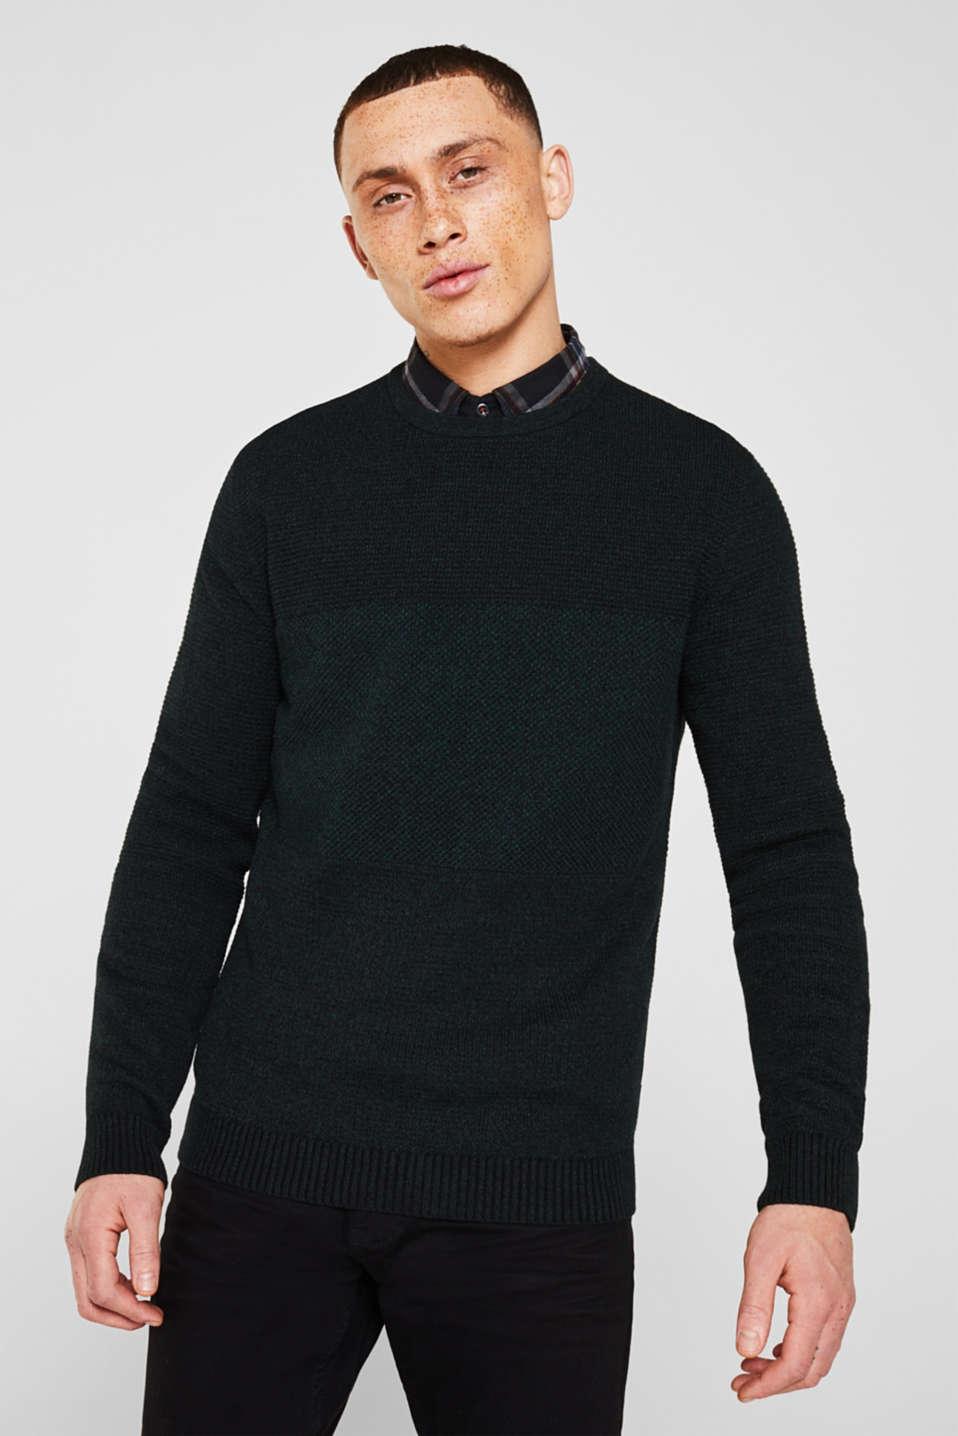 Jumper with textured stripes, 100% cotton, DARK GREEN, detail image number 0